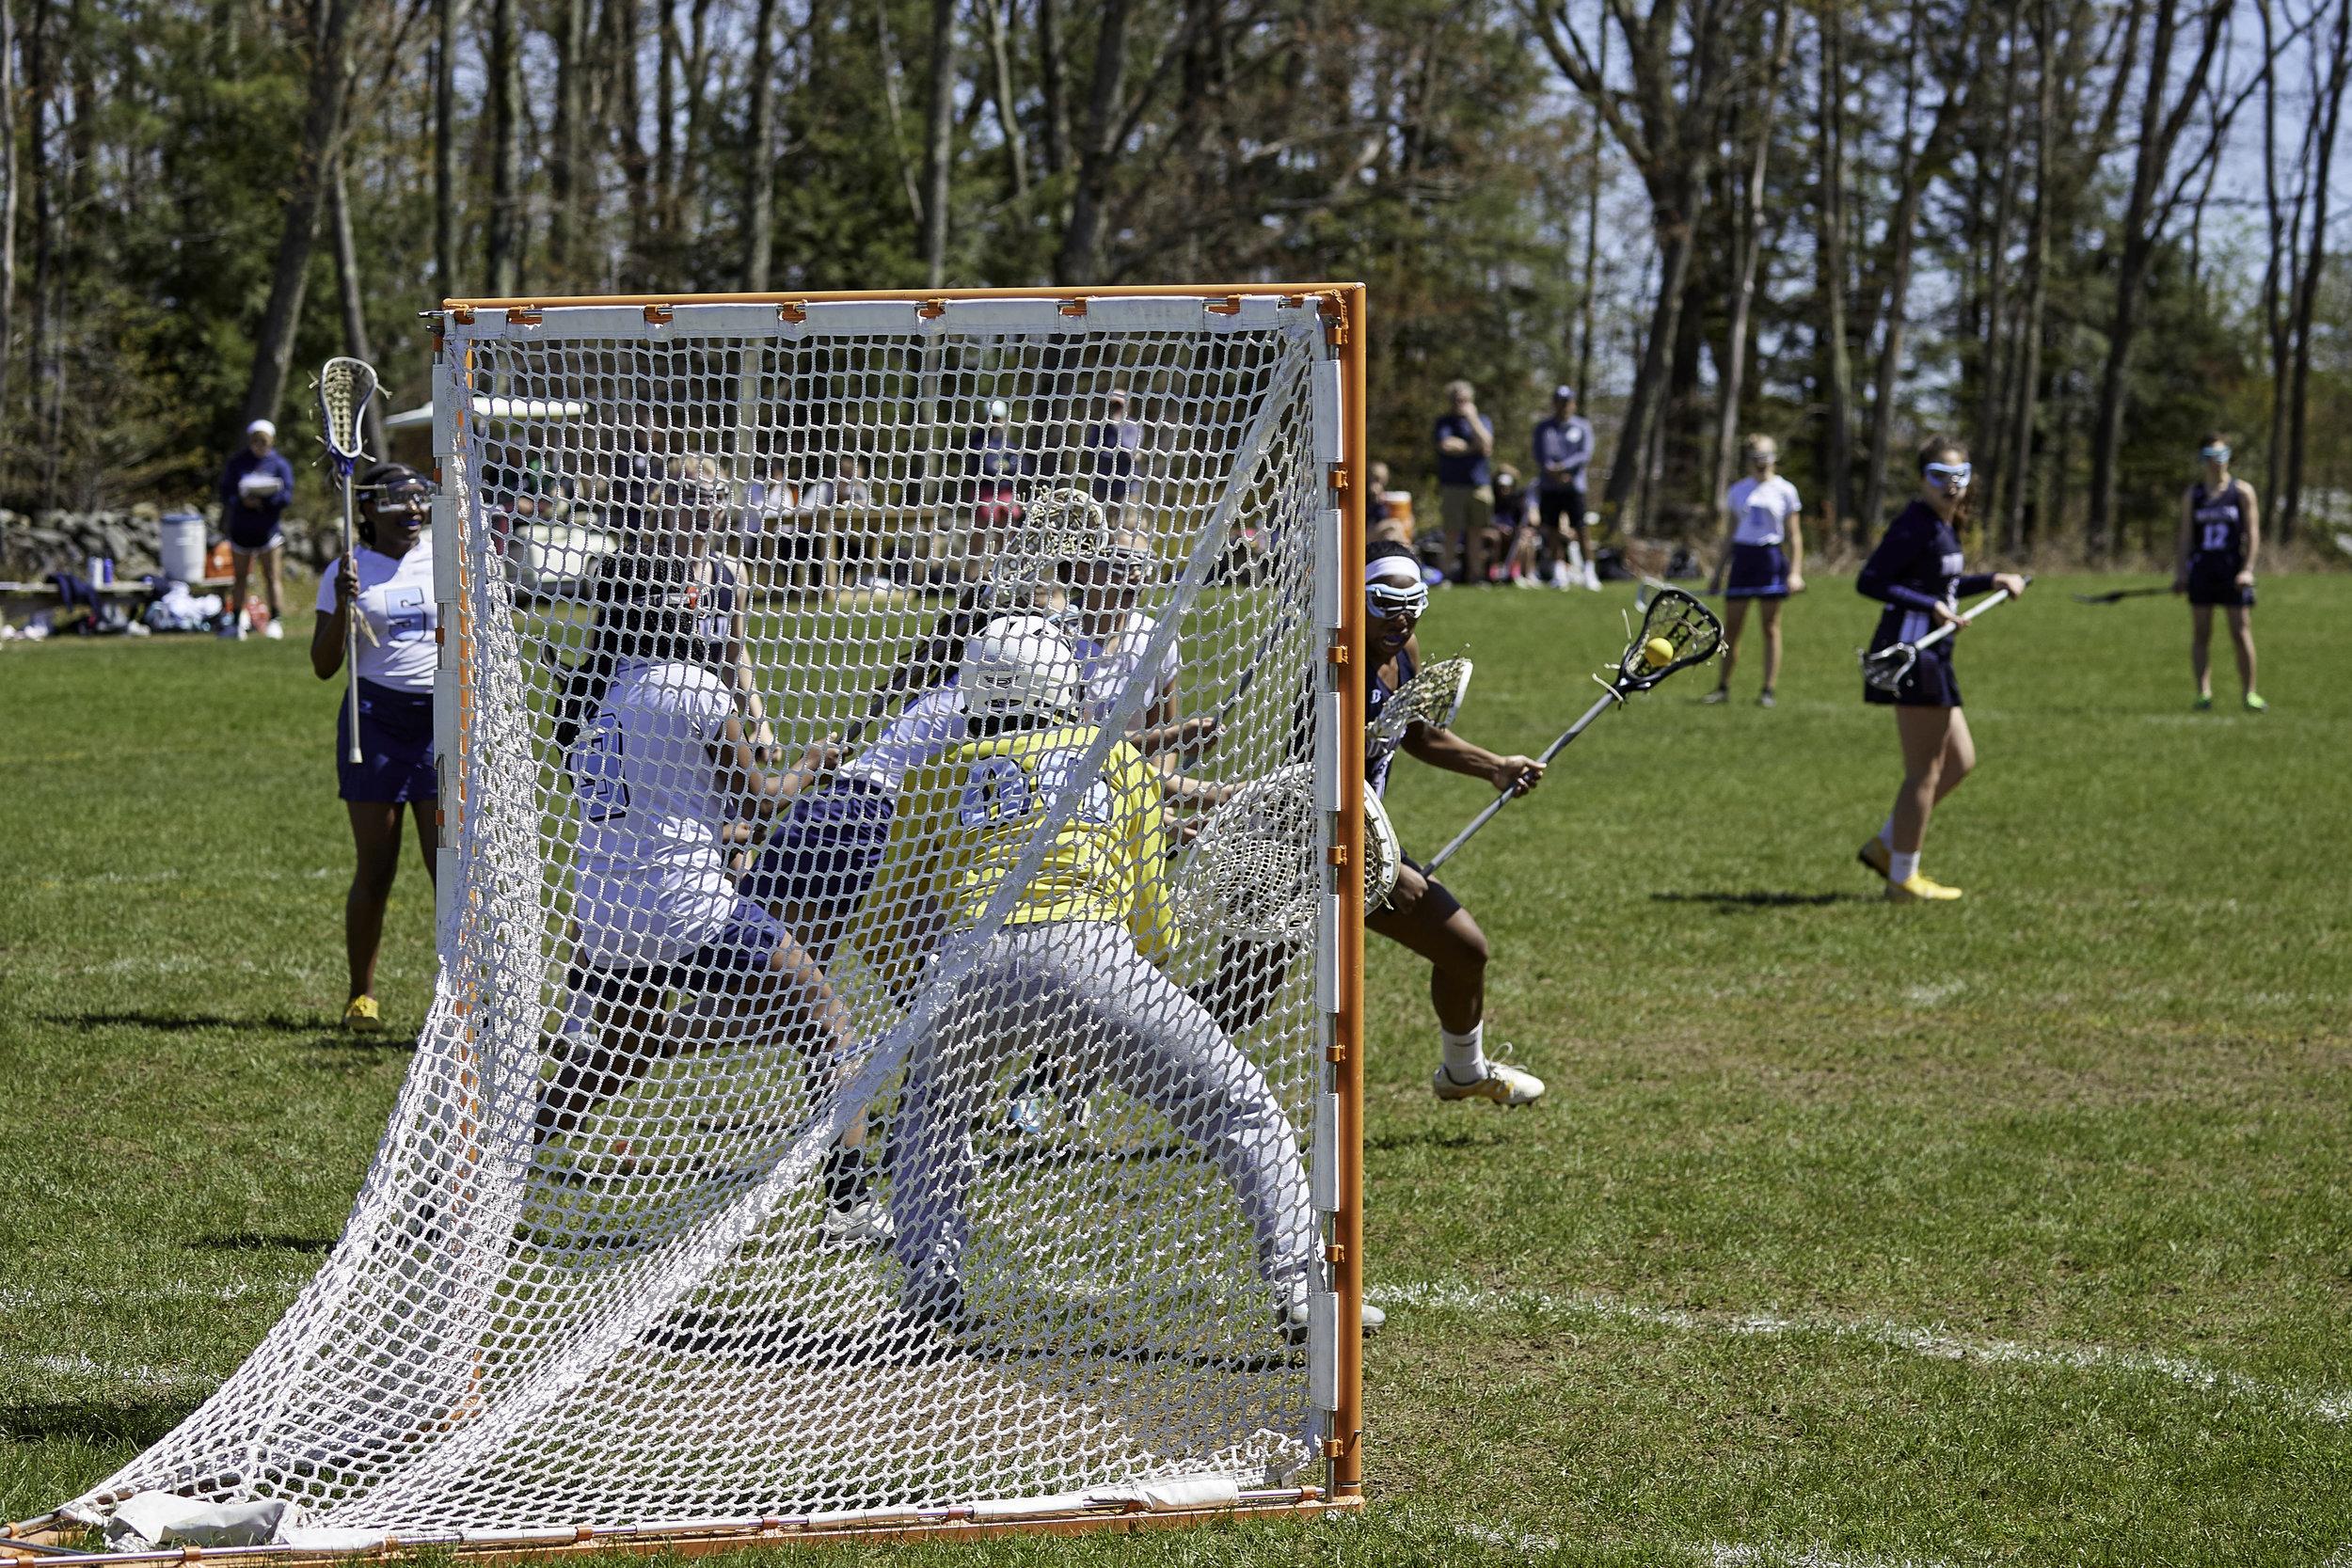 Girls Lacrosse vs. Stoneleigh Burnham School - May 11, 2019 - May 10, 2019193126.jpg